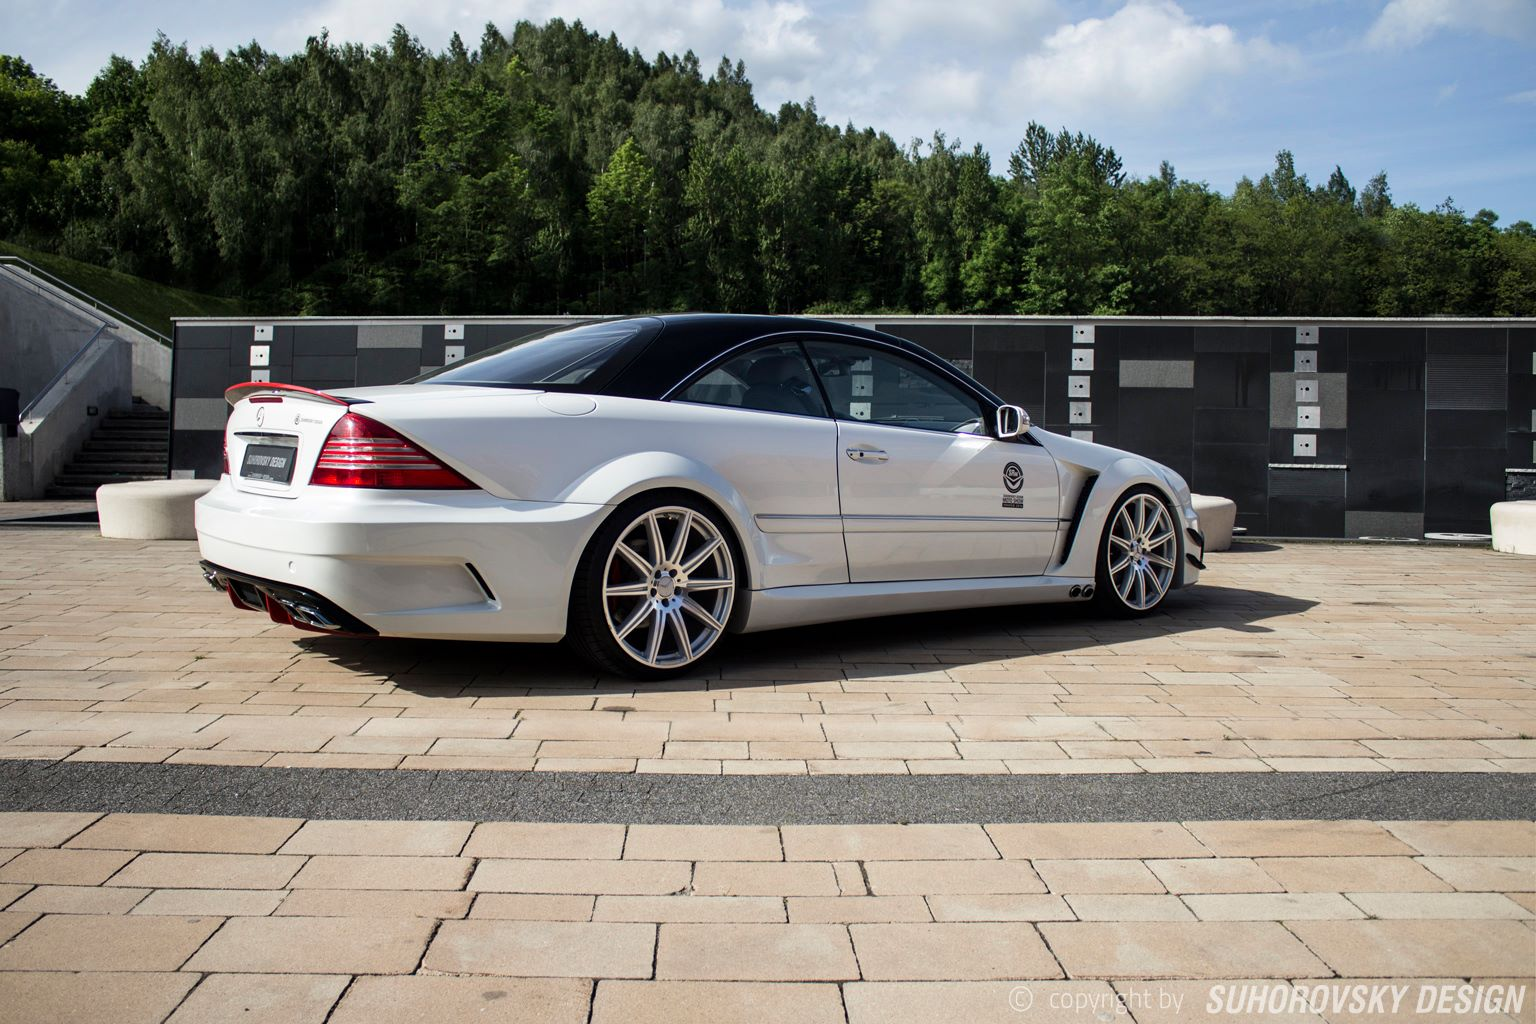 Mclaren Kit Car >> Polish Wide Body Kit Mercedes-Benz CL Features Side ...